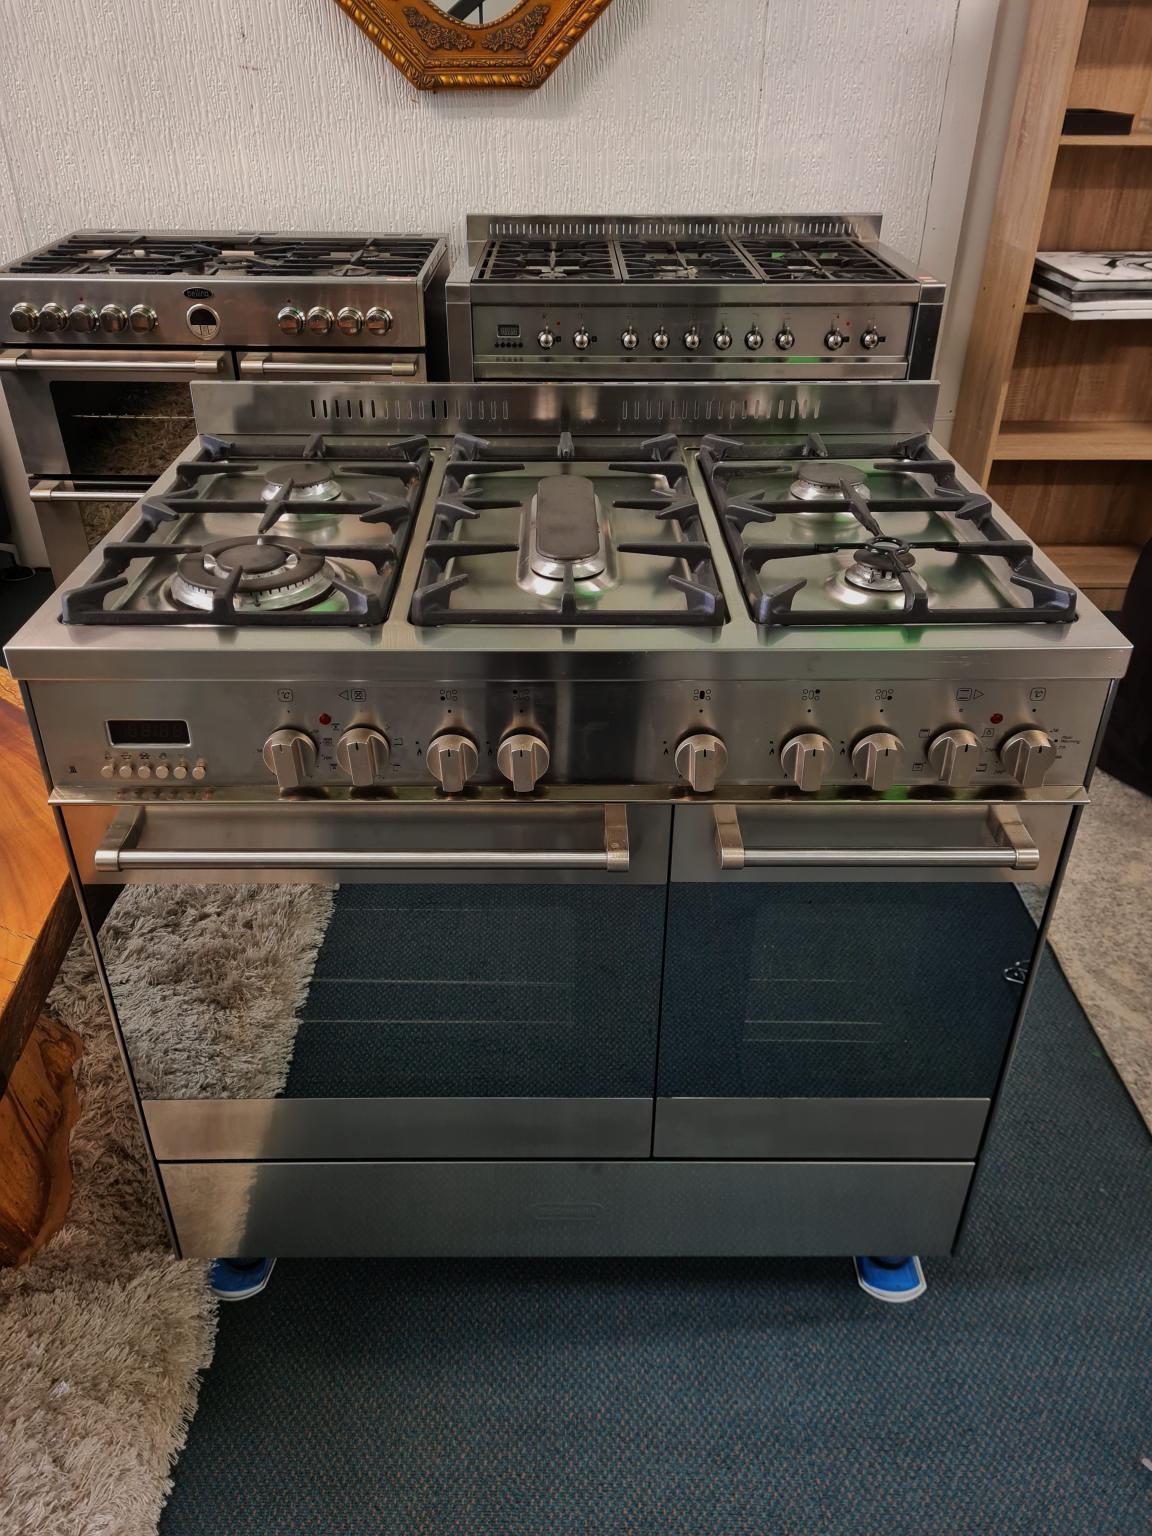 DeLonghi 90cm Freestanding Double Oven Dual Fuel Cooker D926GWF